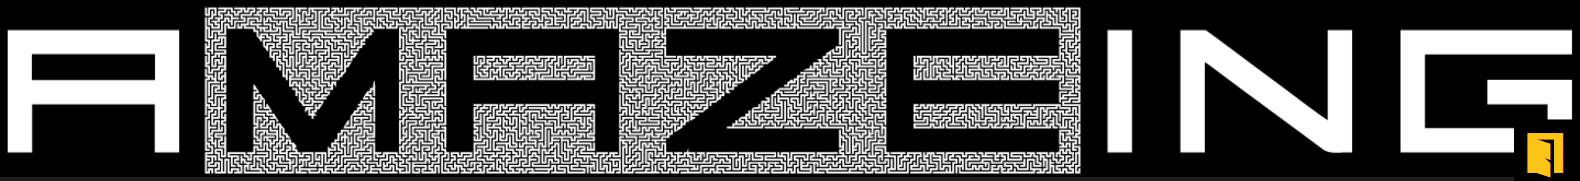 Warsaw Escape Review: Amazeing Escape